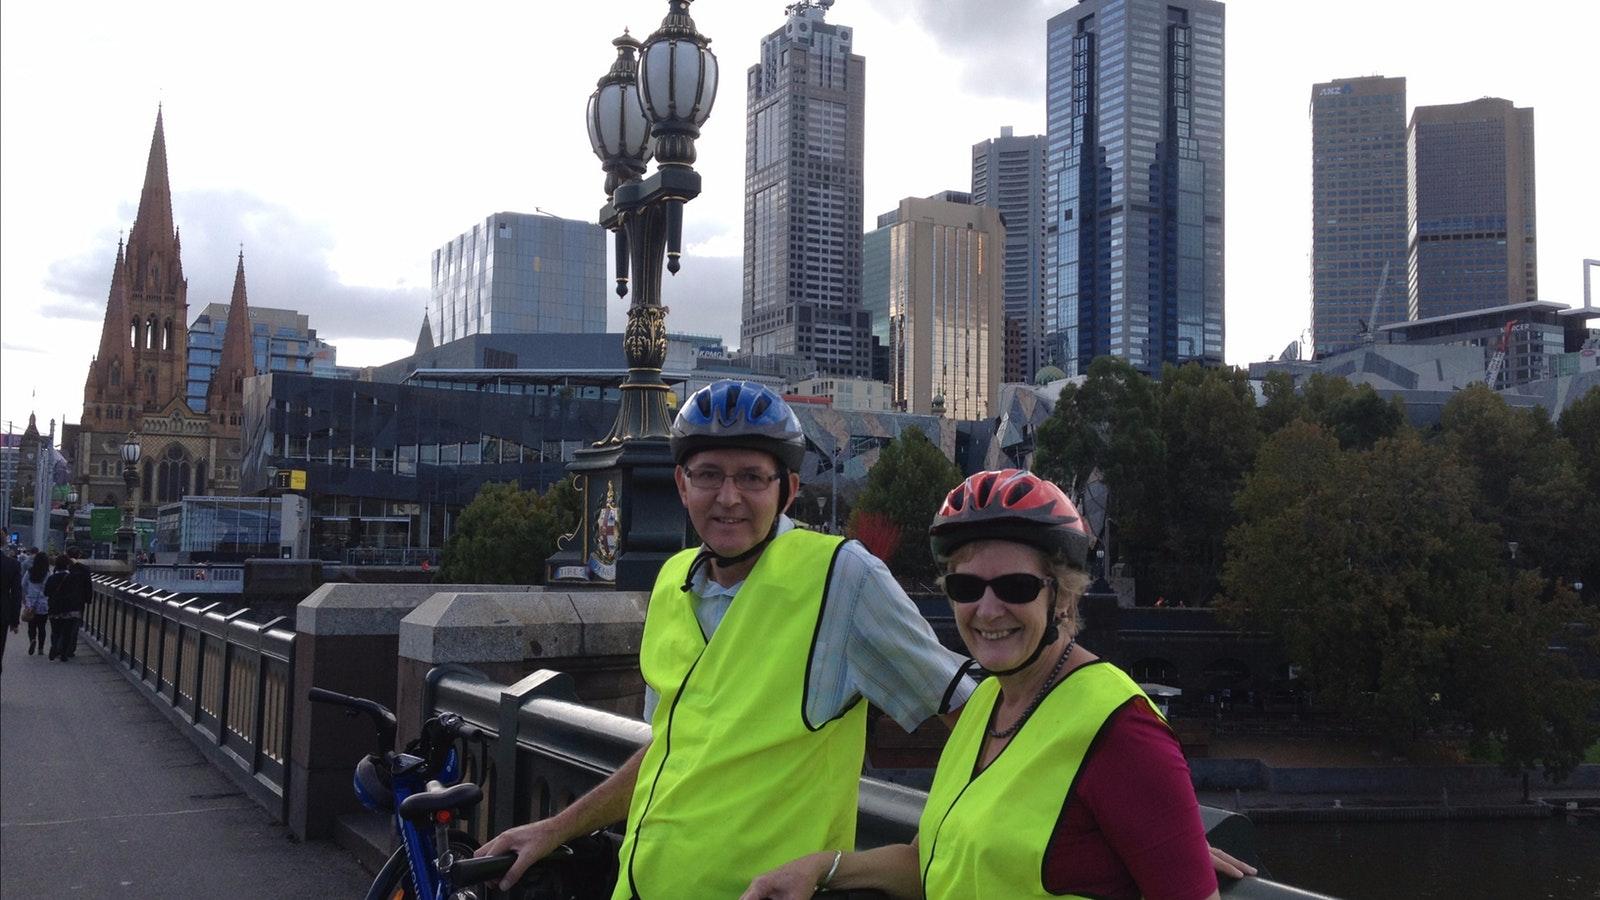 Riding into Melbourne city